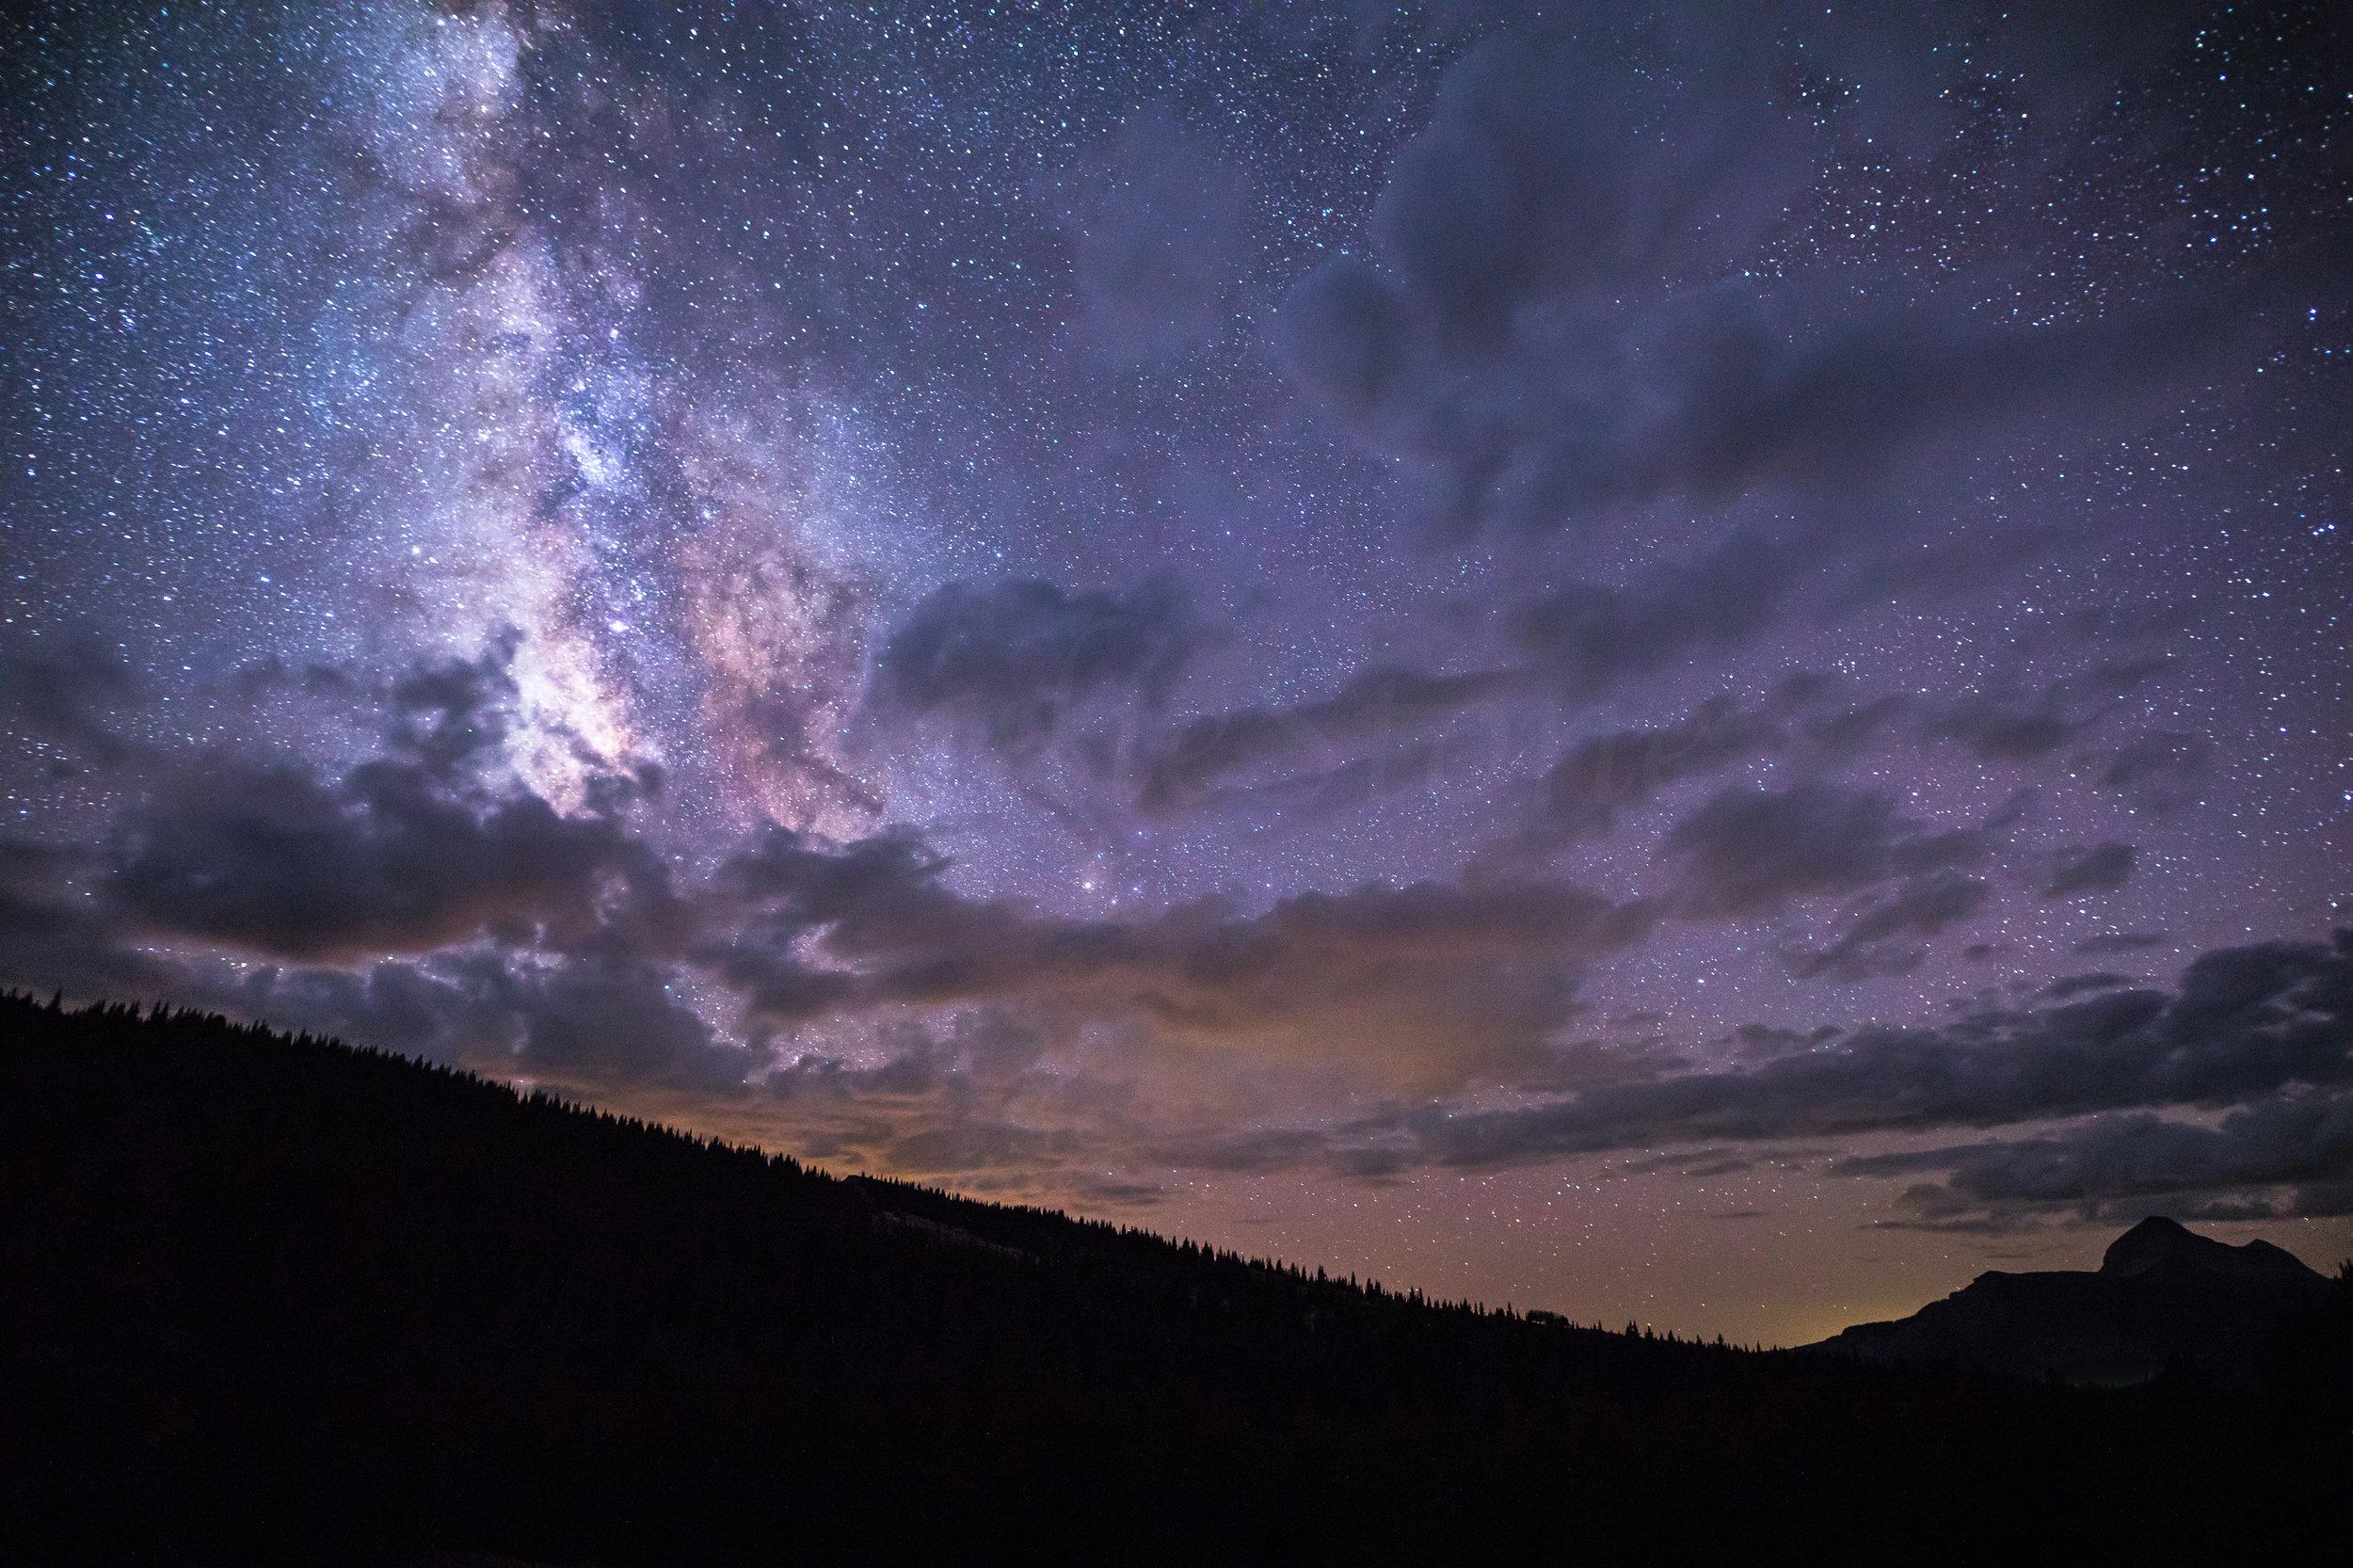 Engineer Mountain Milky Way, Image # 7486